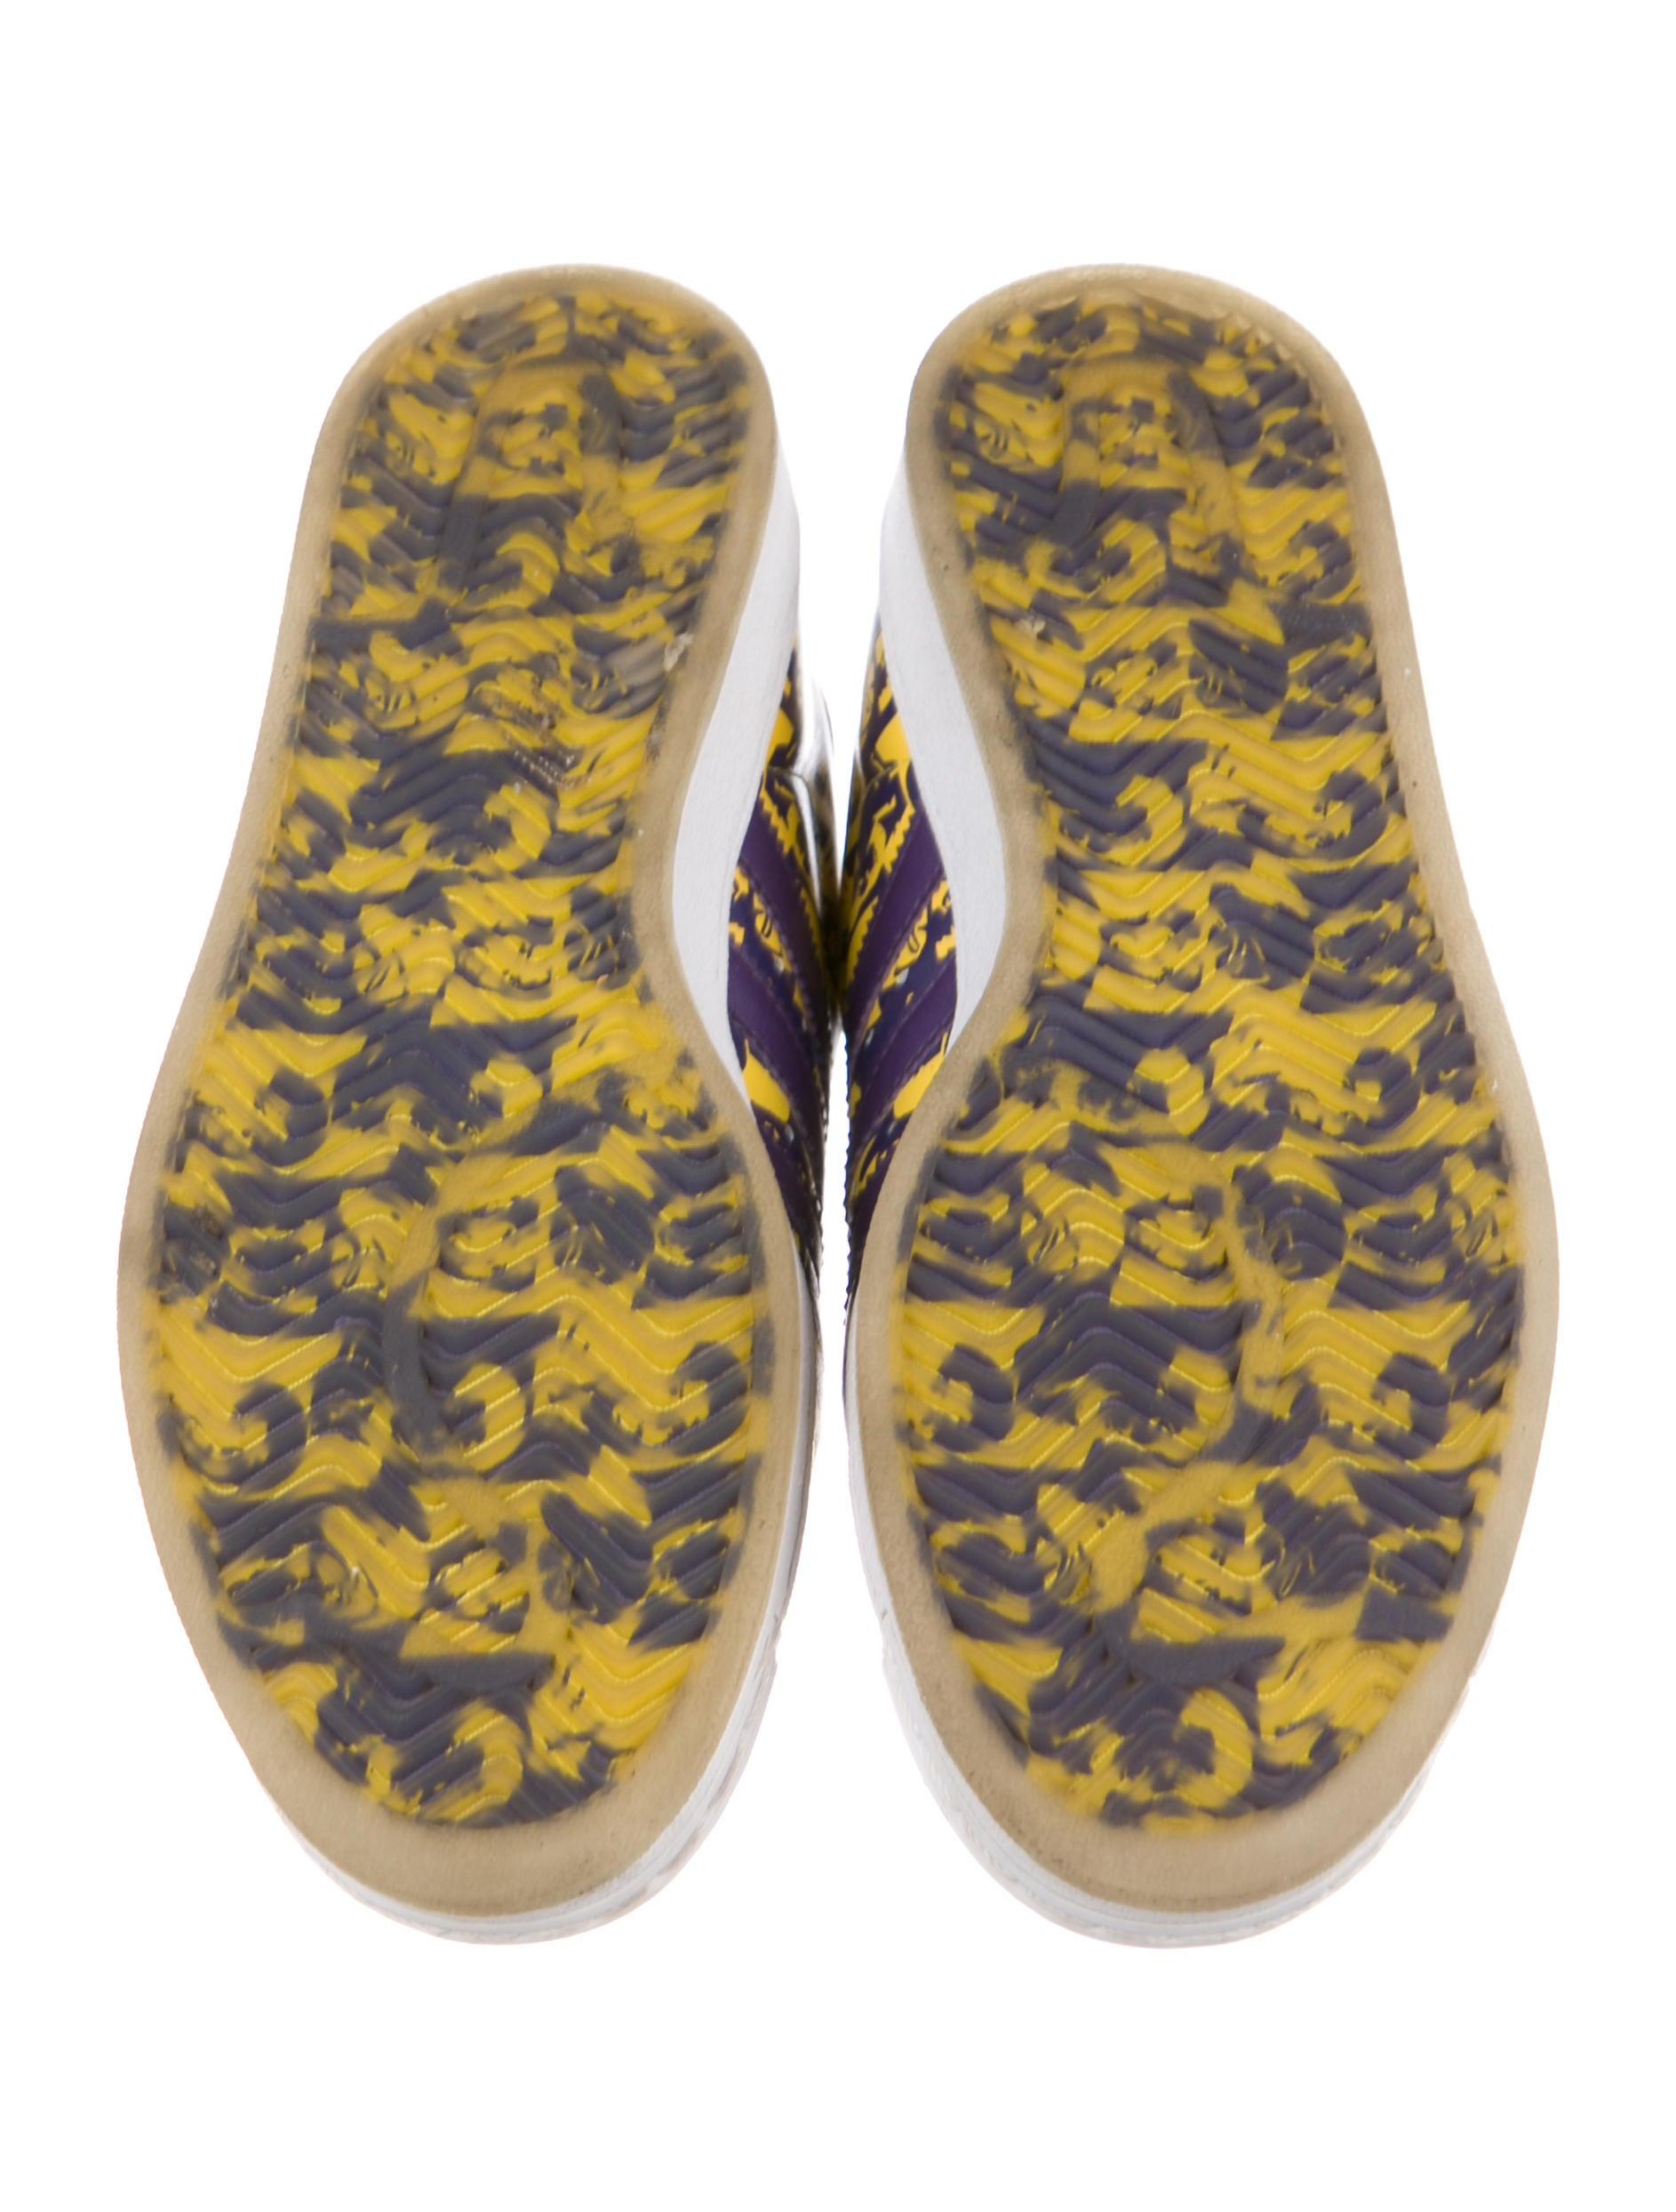 Adidas Superstar 35Th Anniversary Andy Warhol: Adidas